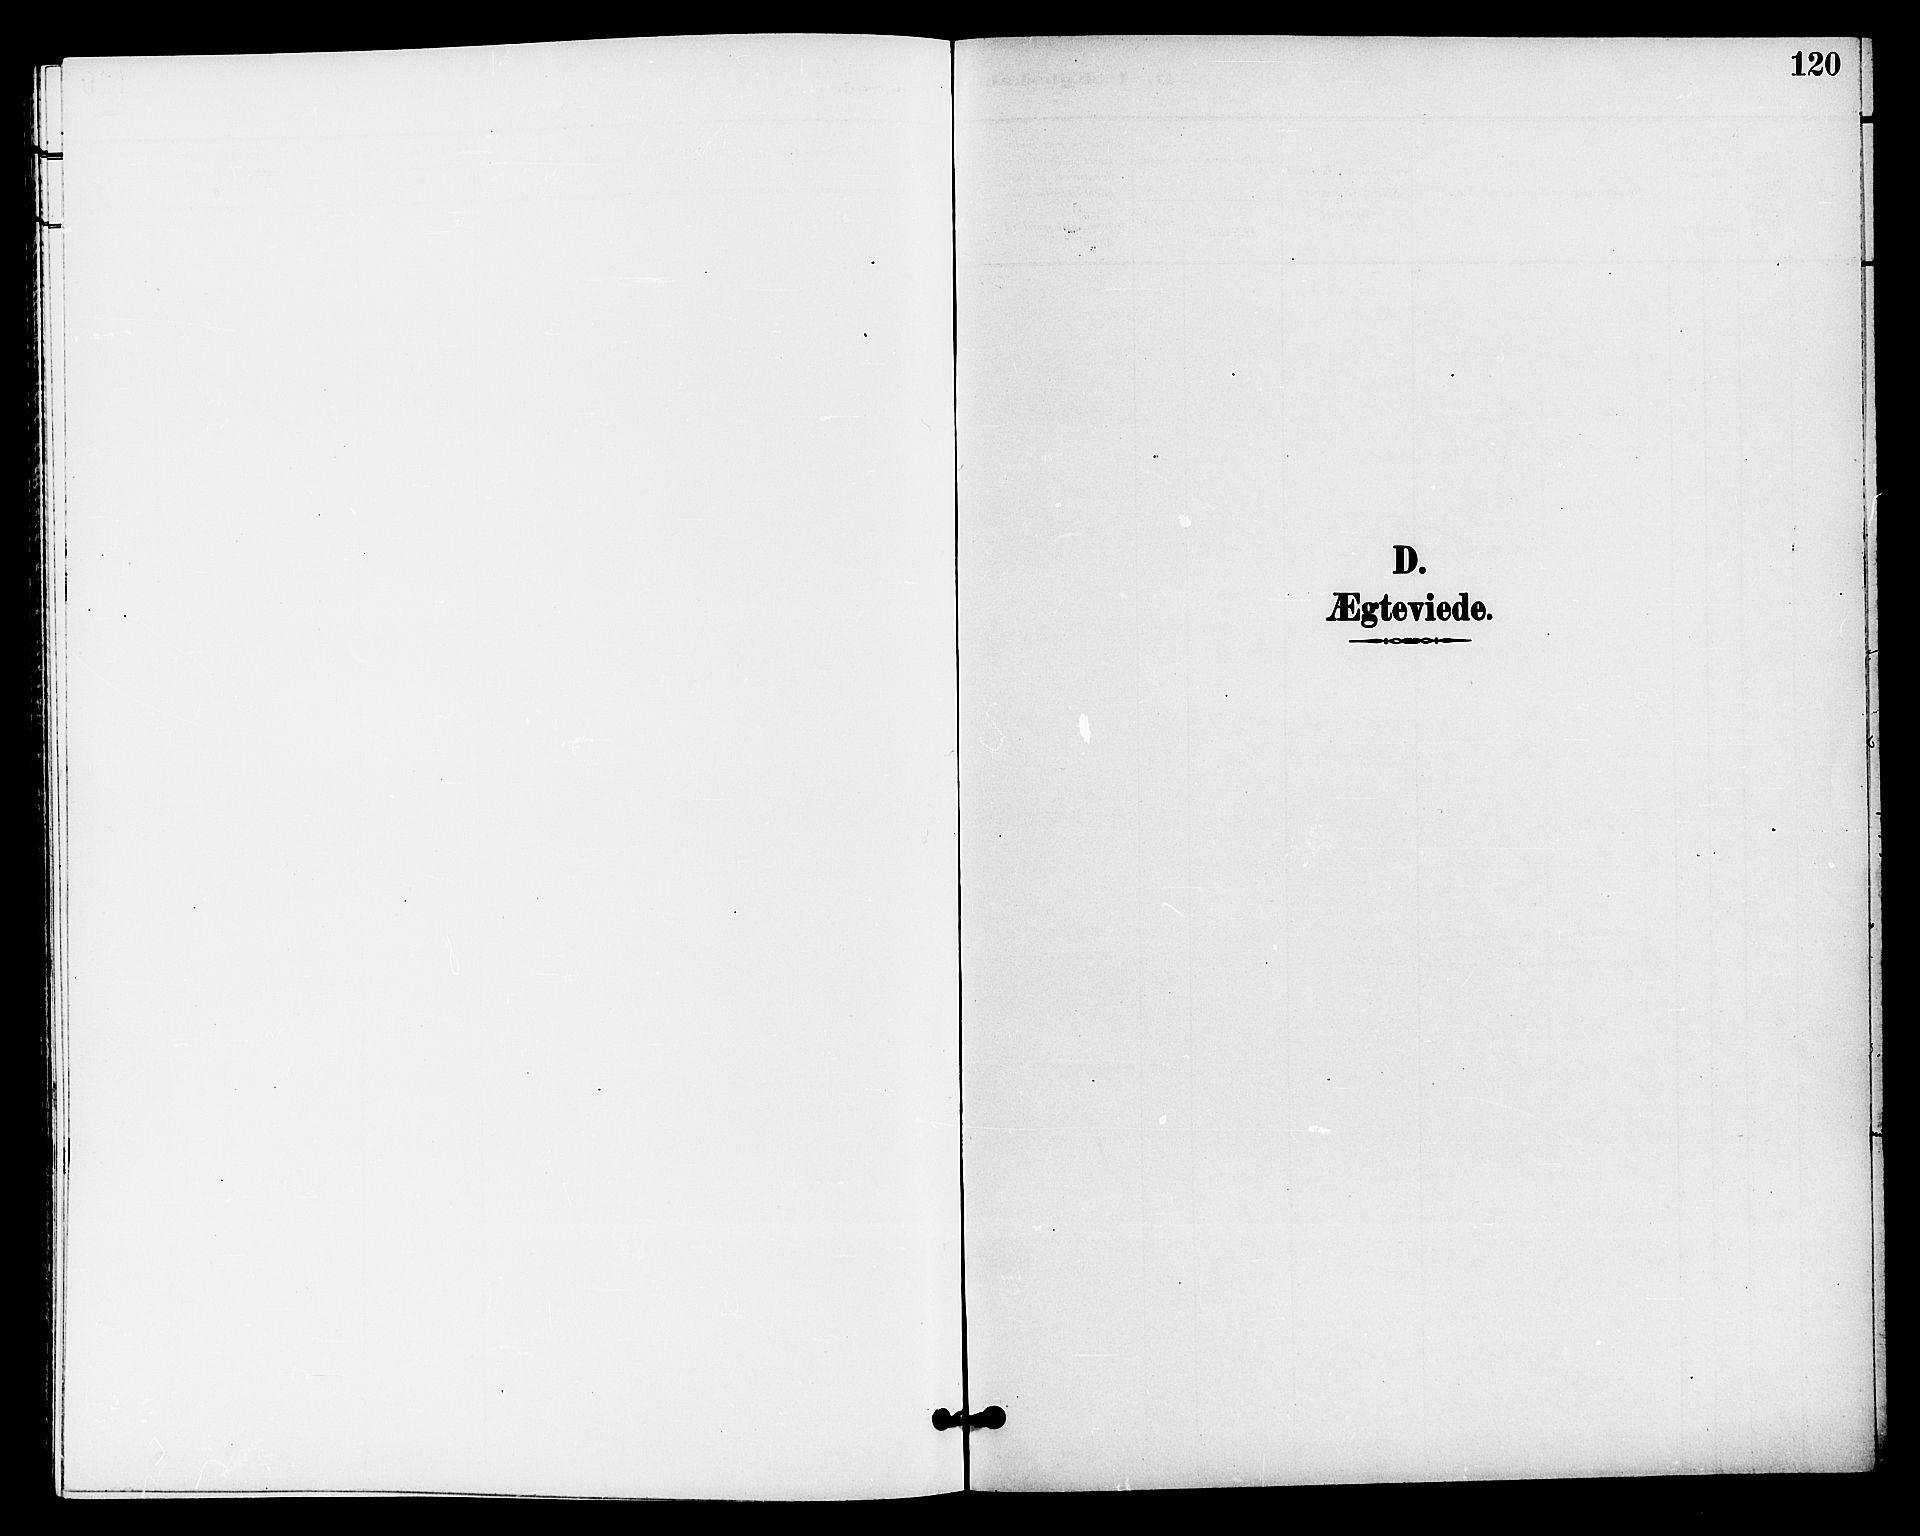 SAKO, Bø kirkebøker, G/Ga/L0006: Klokkerbok nr. 6, 1898-1909, s. 120